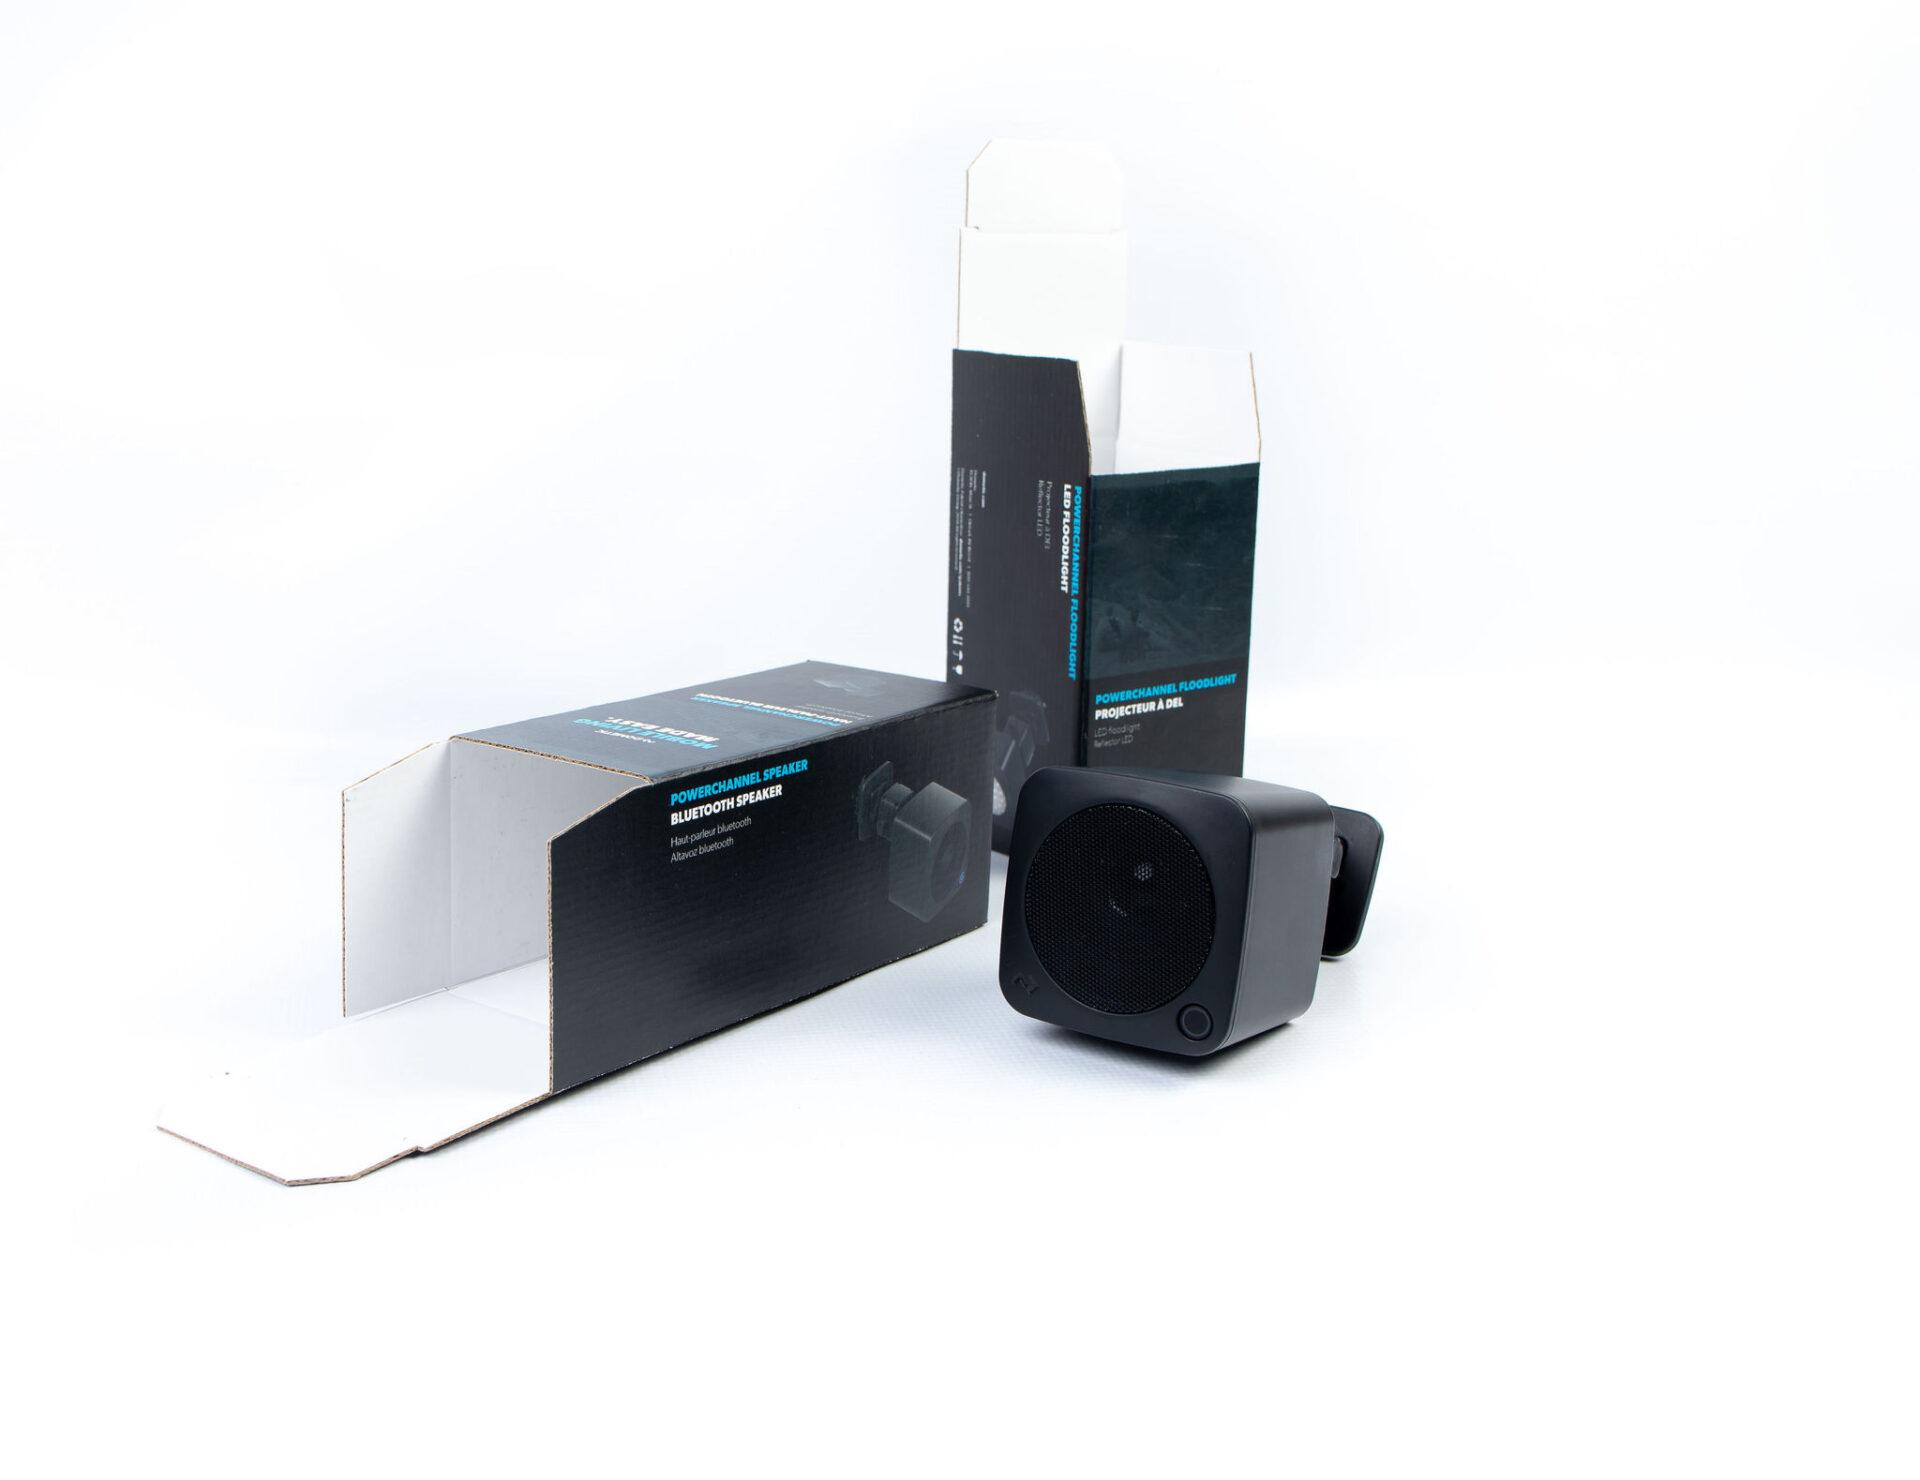 bluetooth speaker next to its cardboard packaging